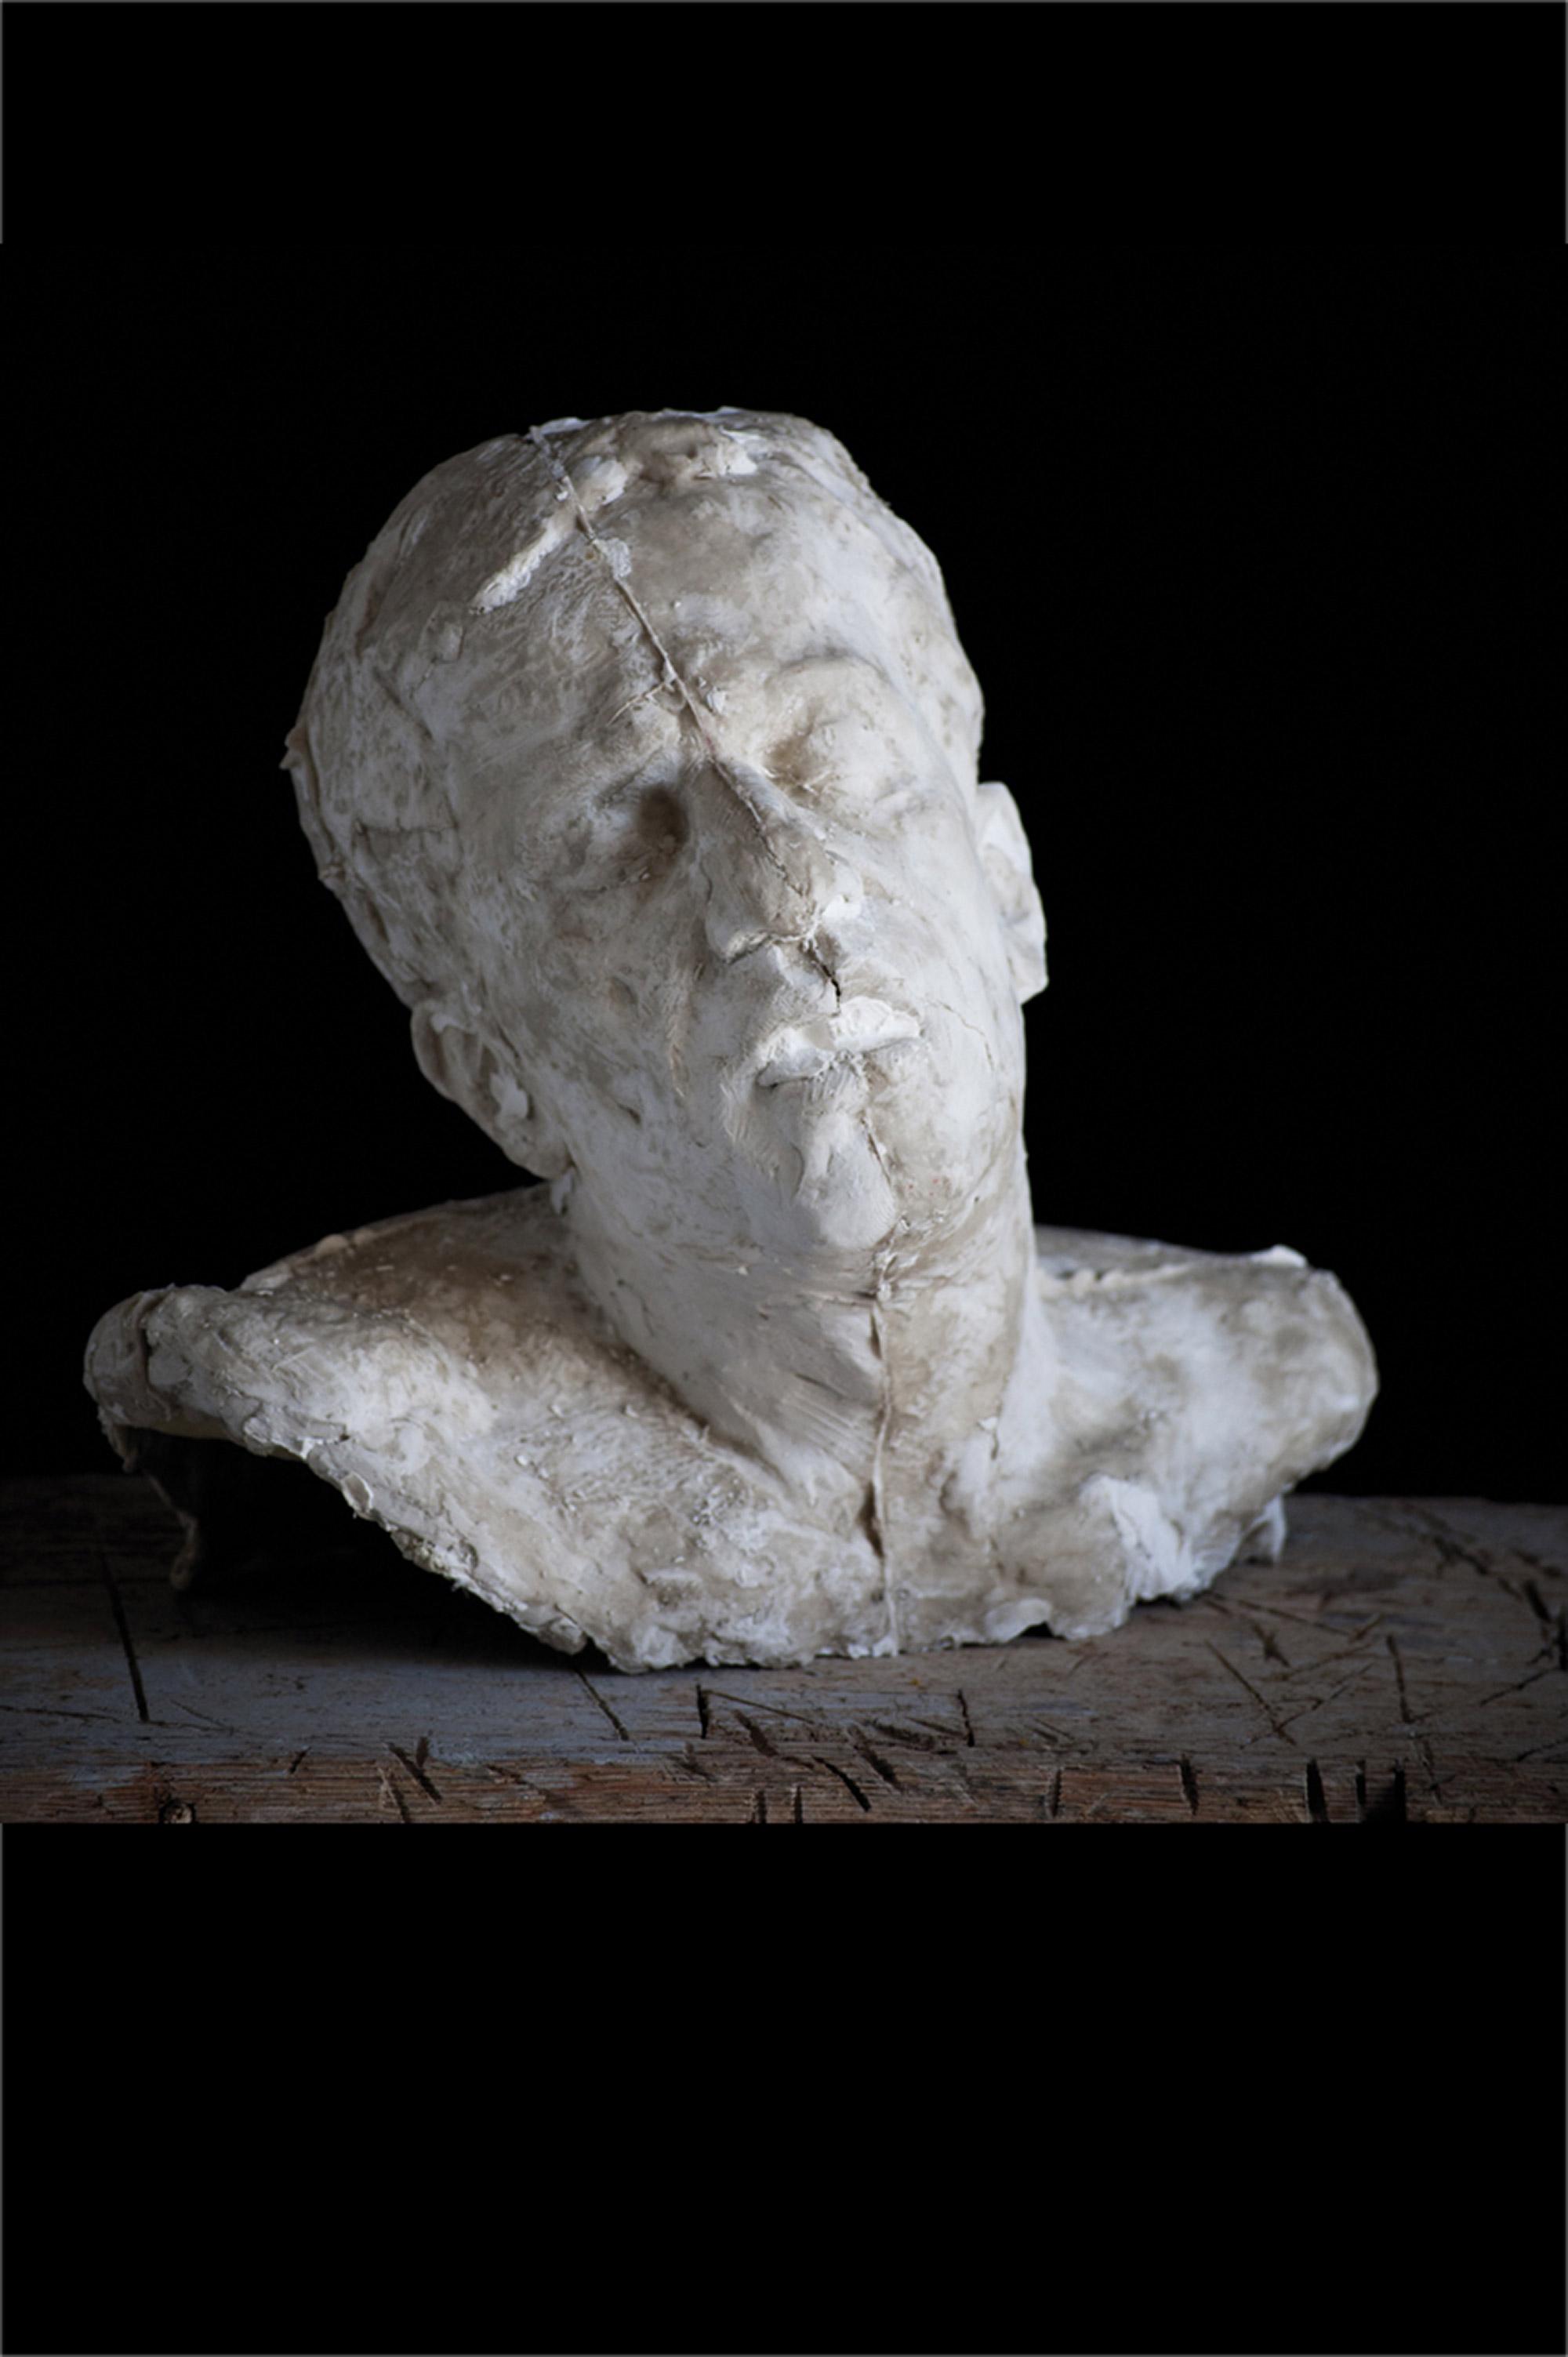 New-York-Academy-of-Art-Carrara-Residency-Heather-Personett-Zoe-Suenson-Taylor20171213_0058.jpg